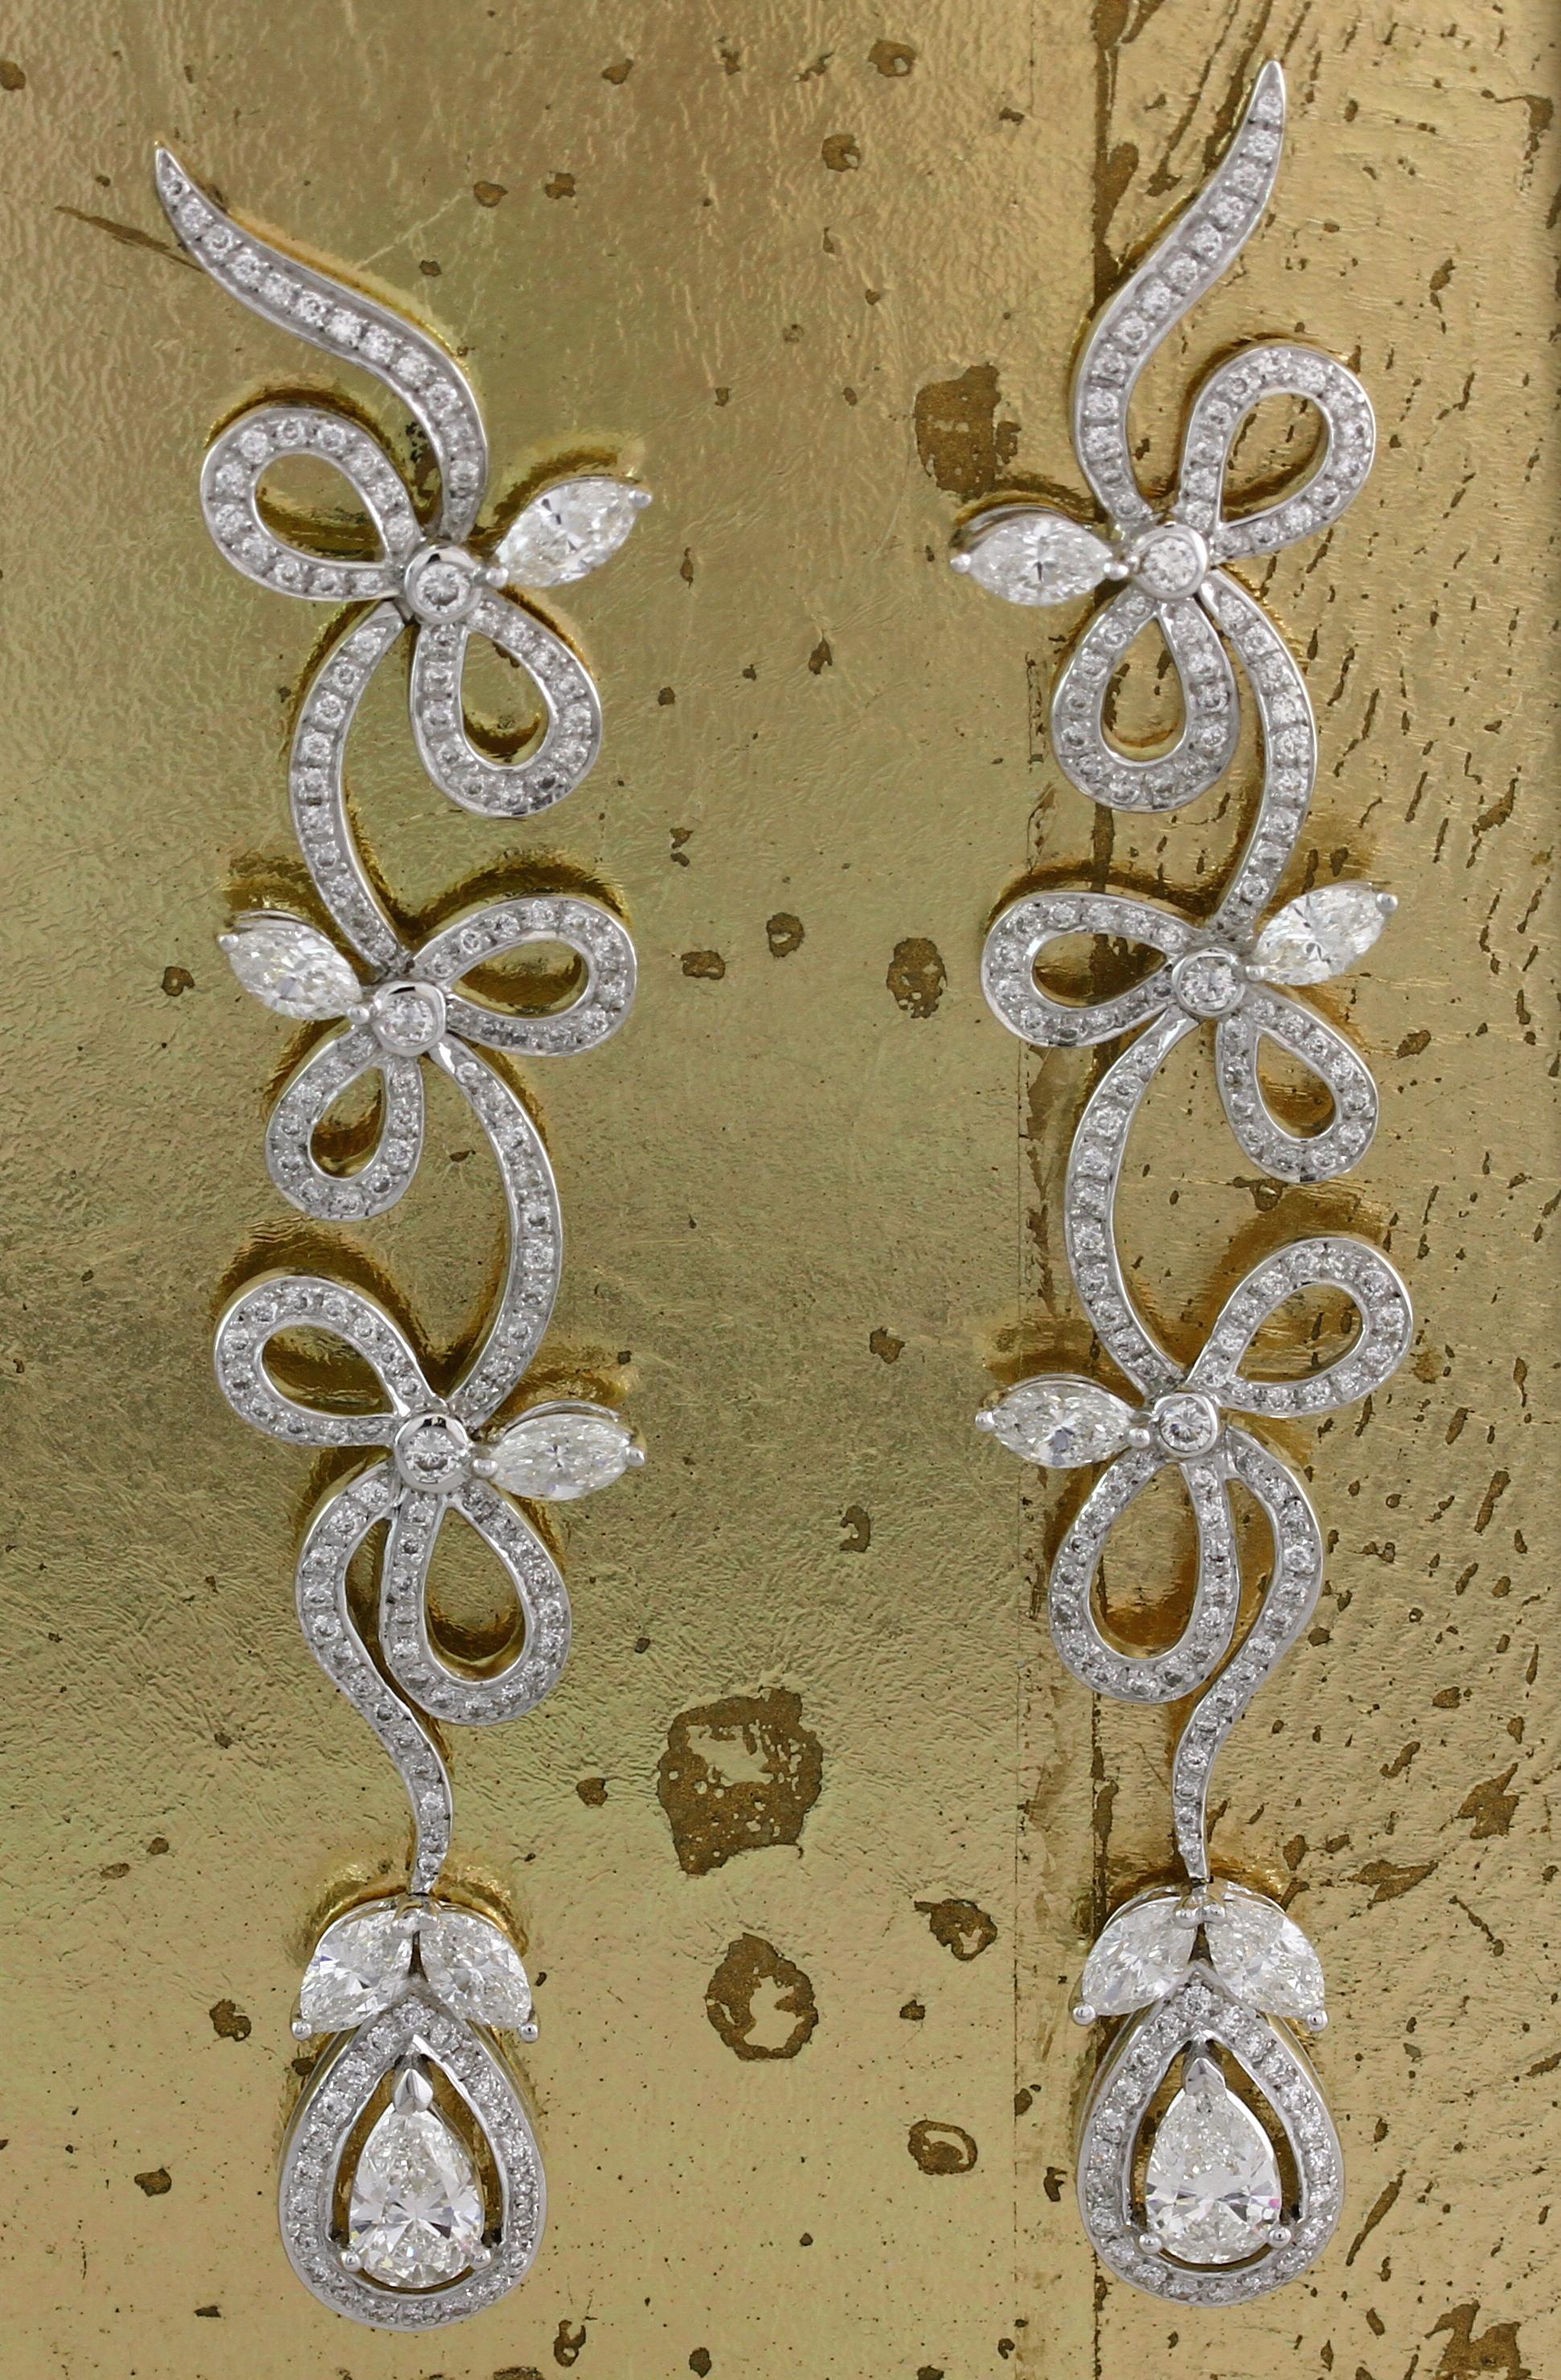 Pear shaped Diamond Earrings - Item No: 0013235